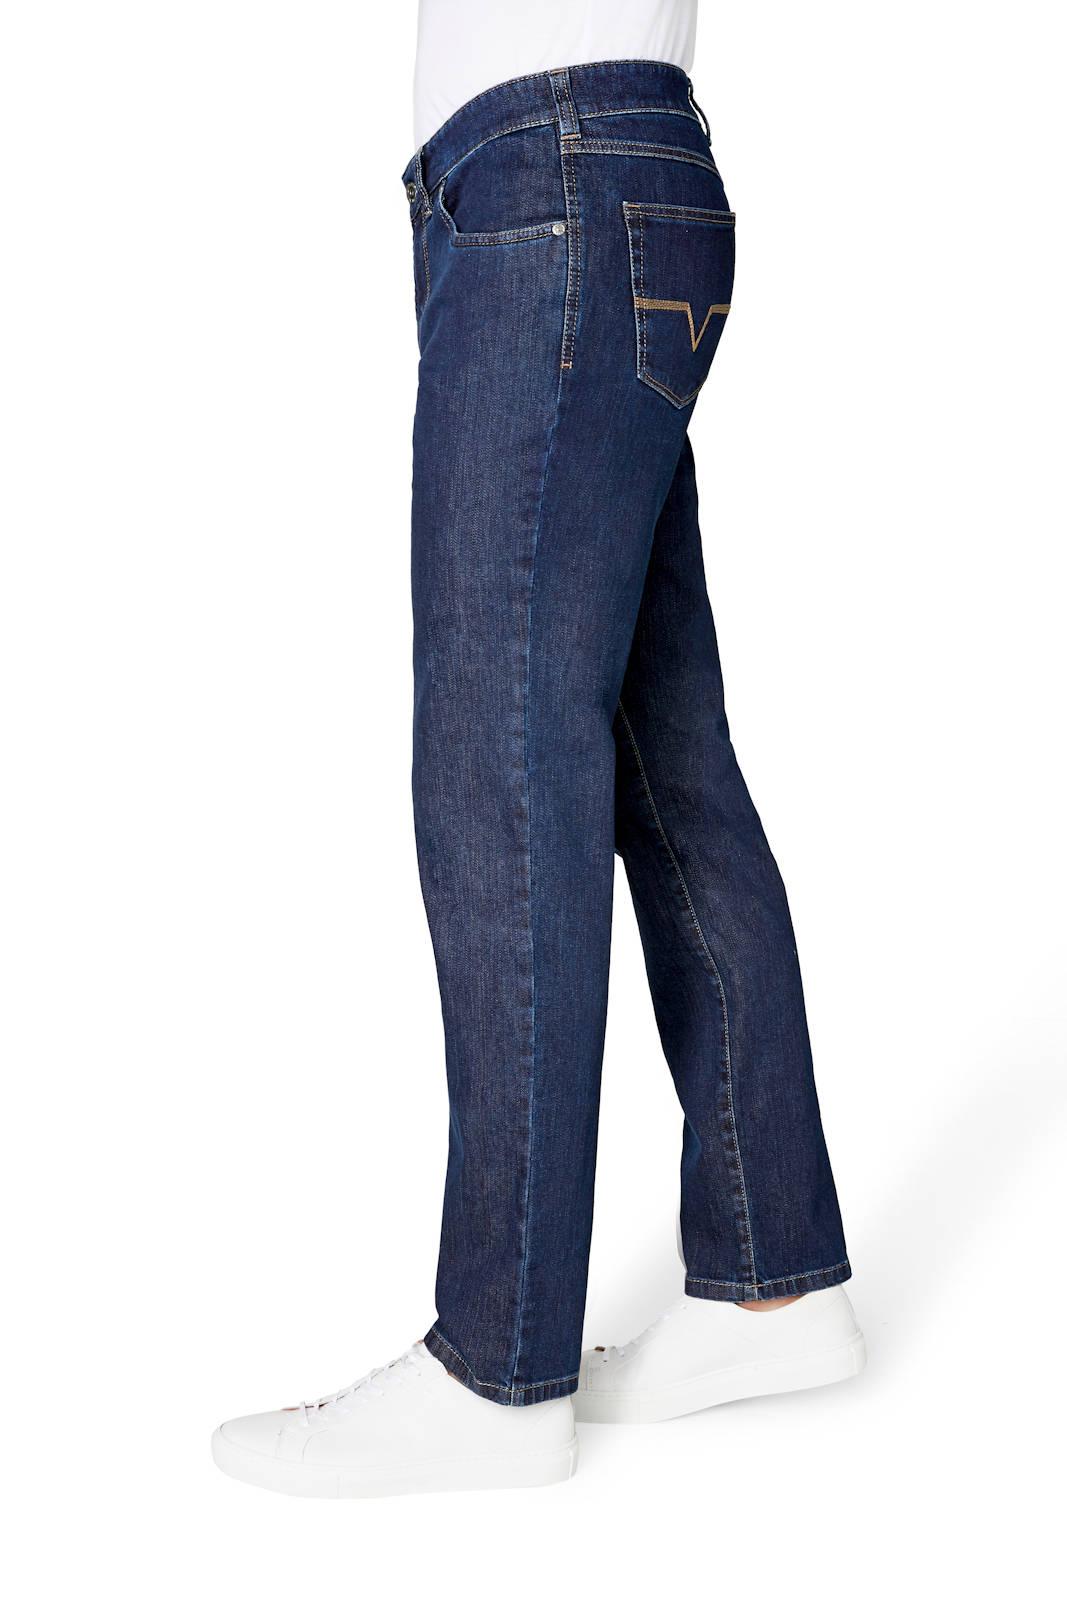 Atelier-GARDEUR-Jeans-NEVIO-11-Regular-Fit-Herren-Hose-Straight-Leg-Denim-NEU Indexbild 7